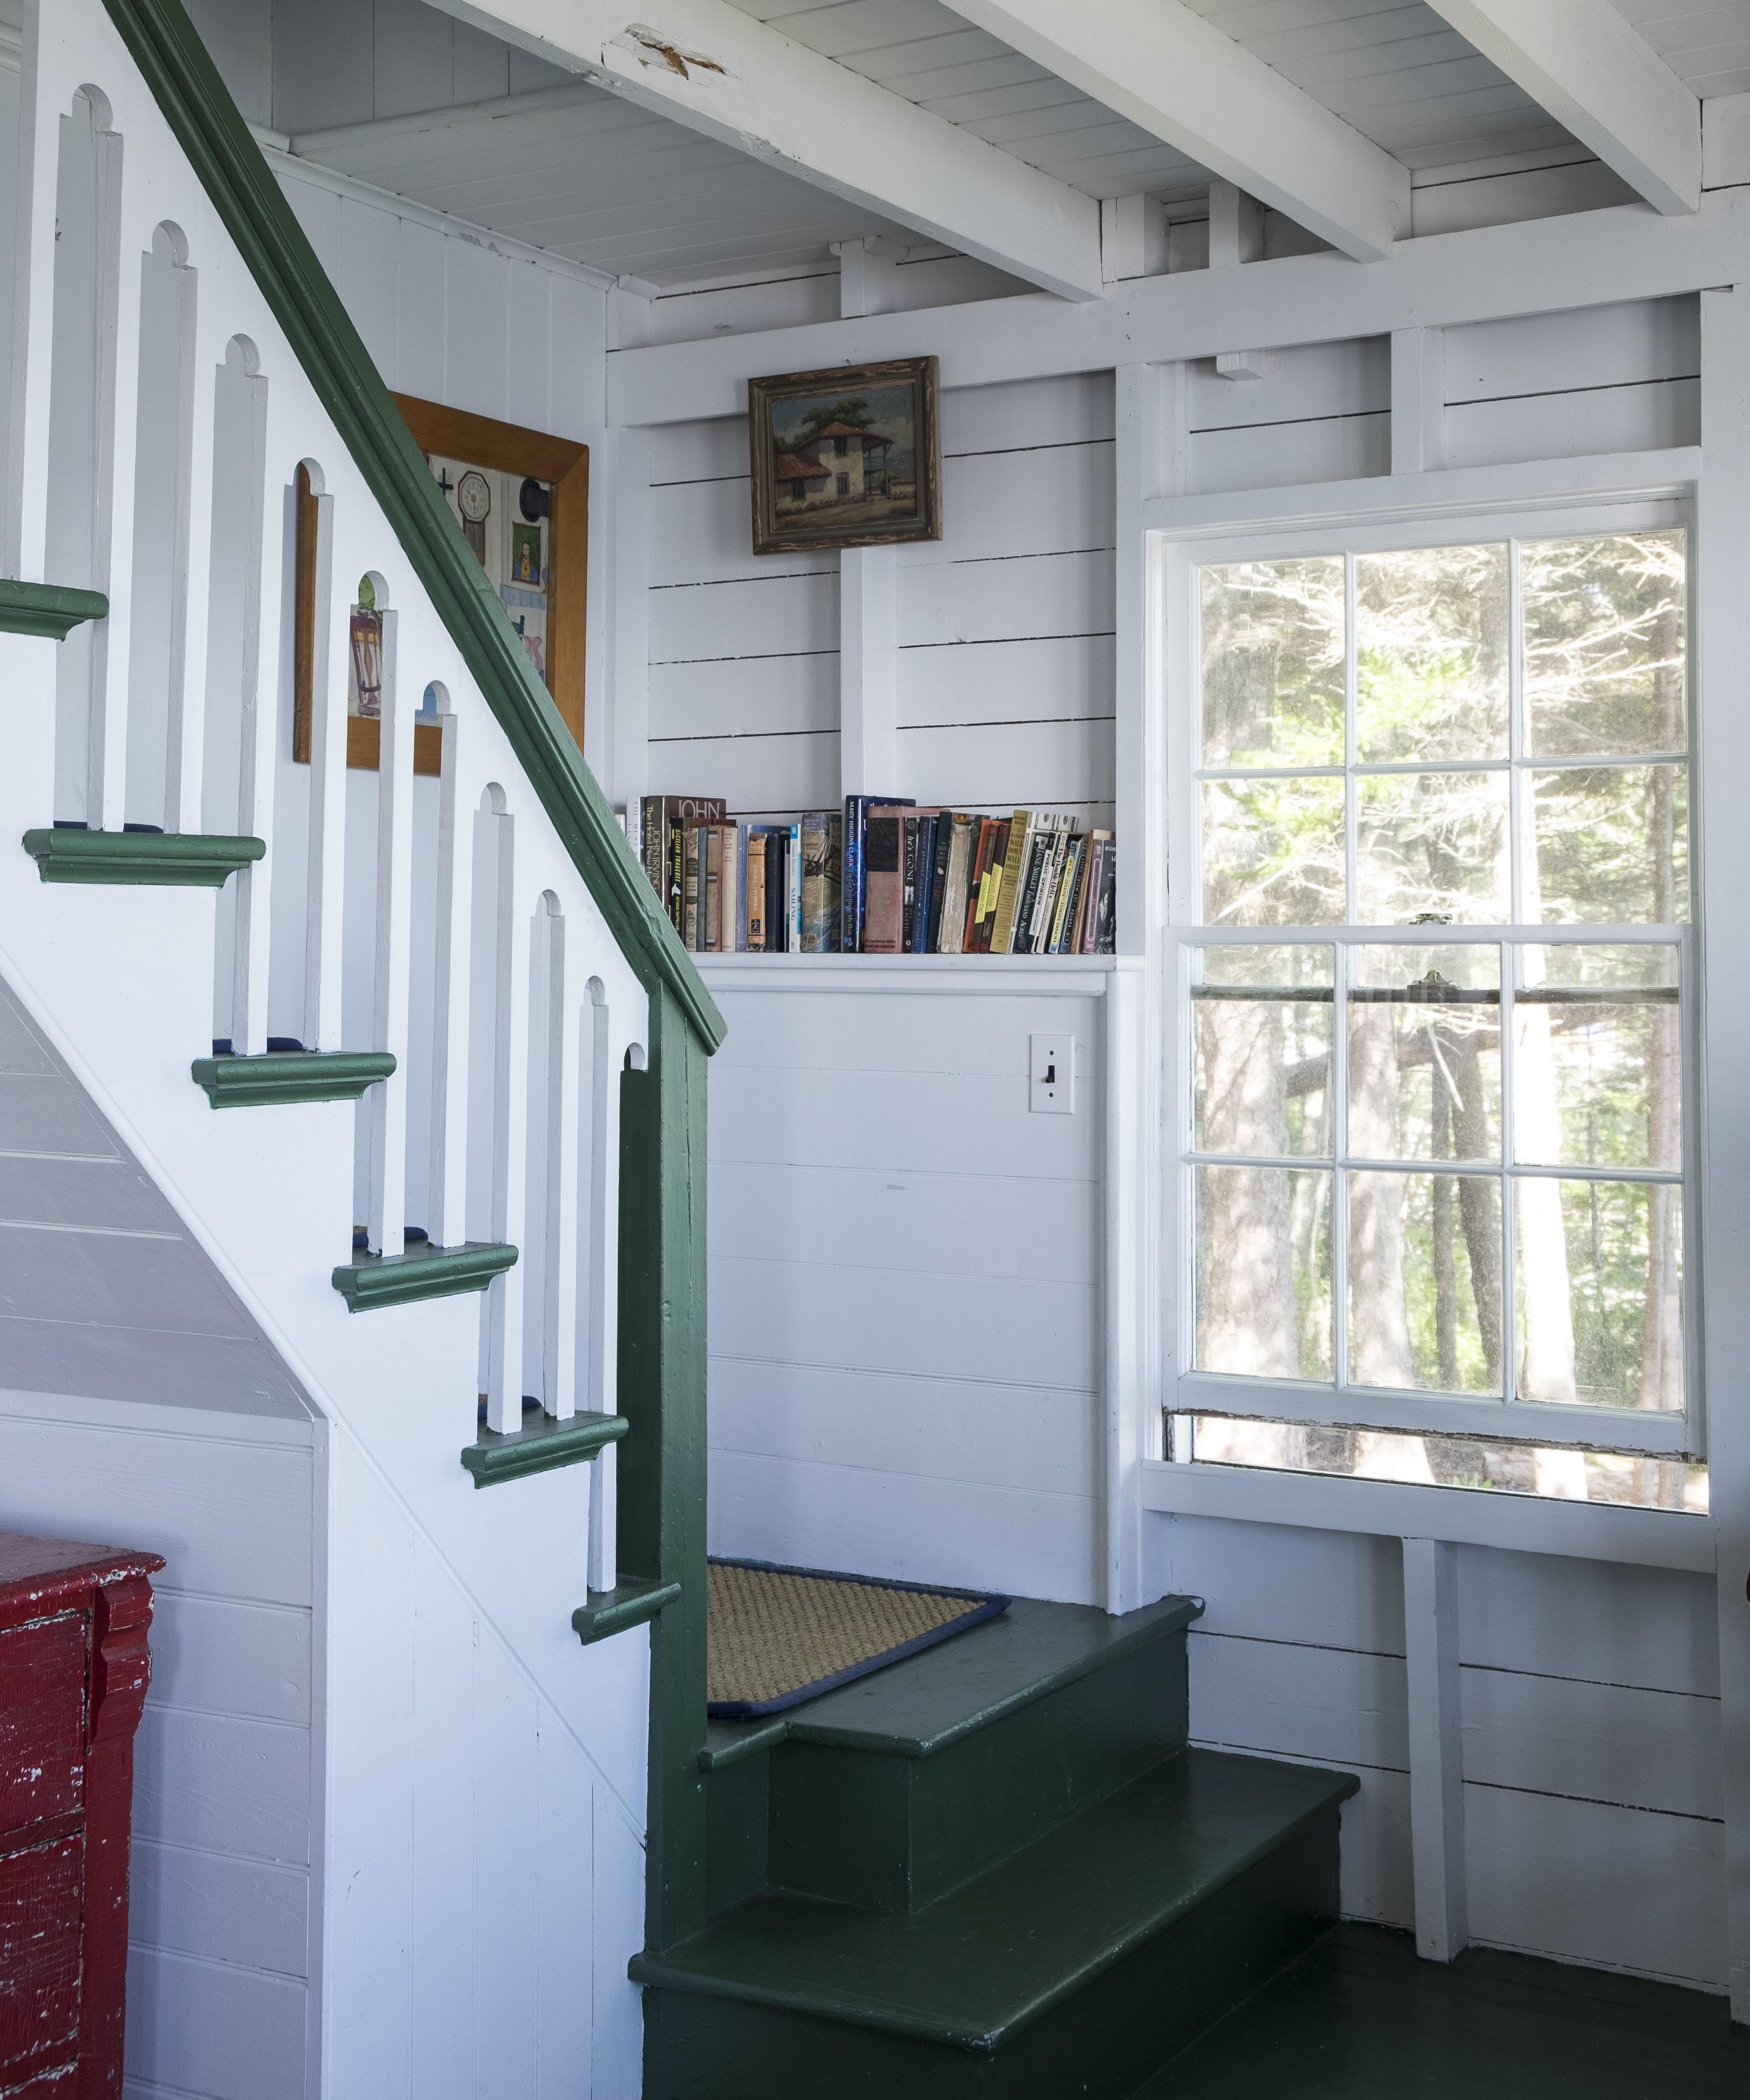 HB_Cameron_Maine-004- stair